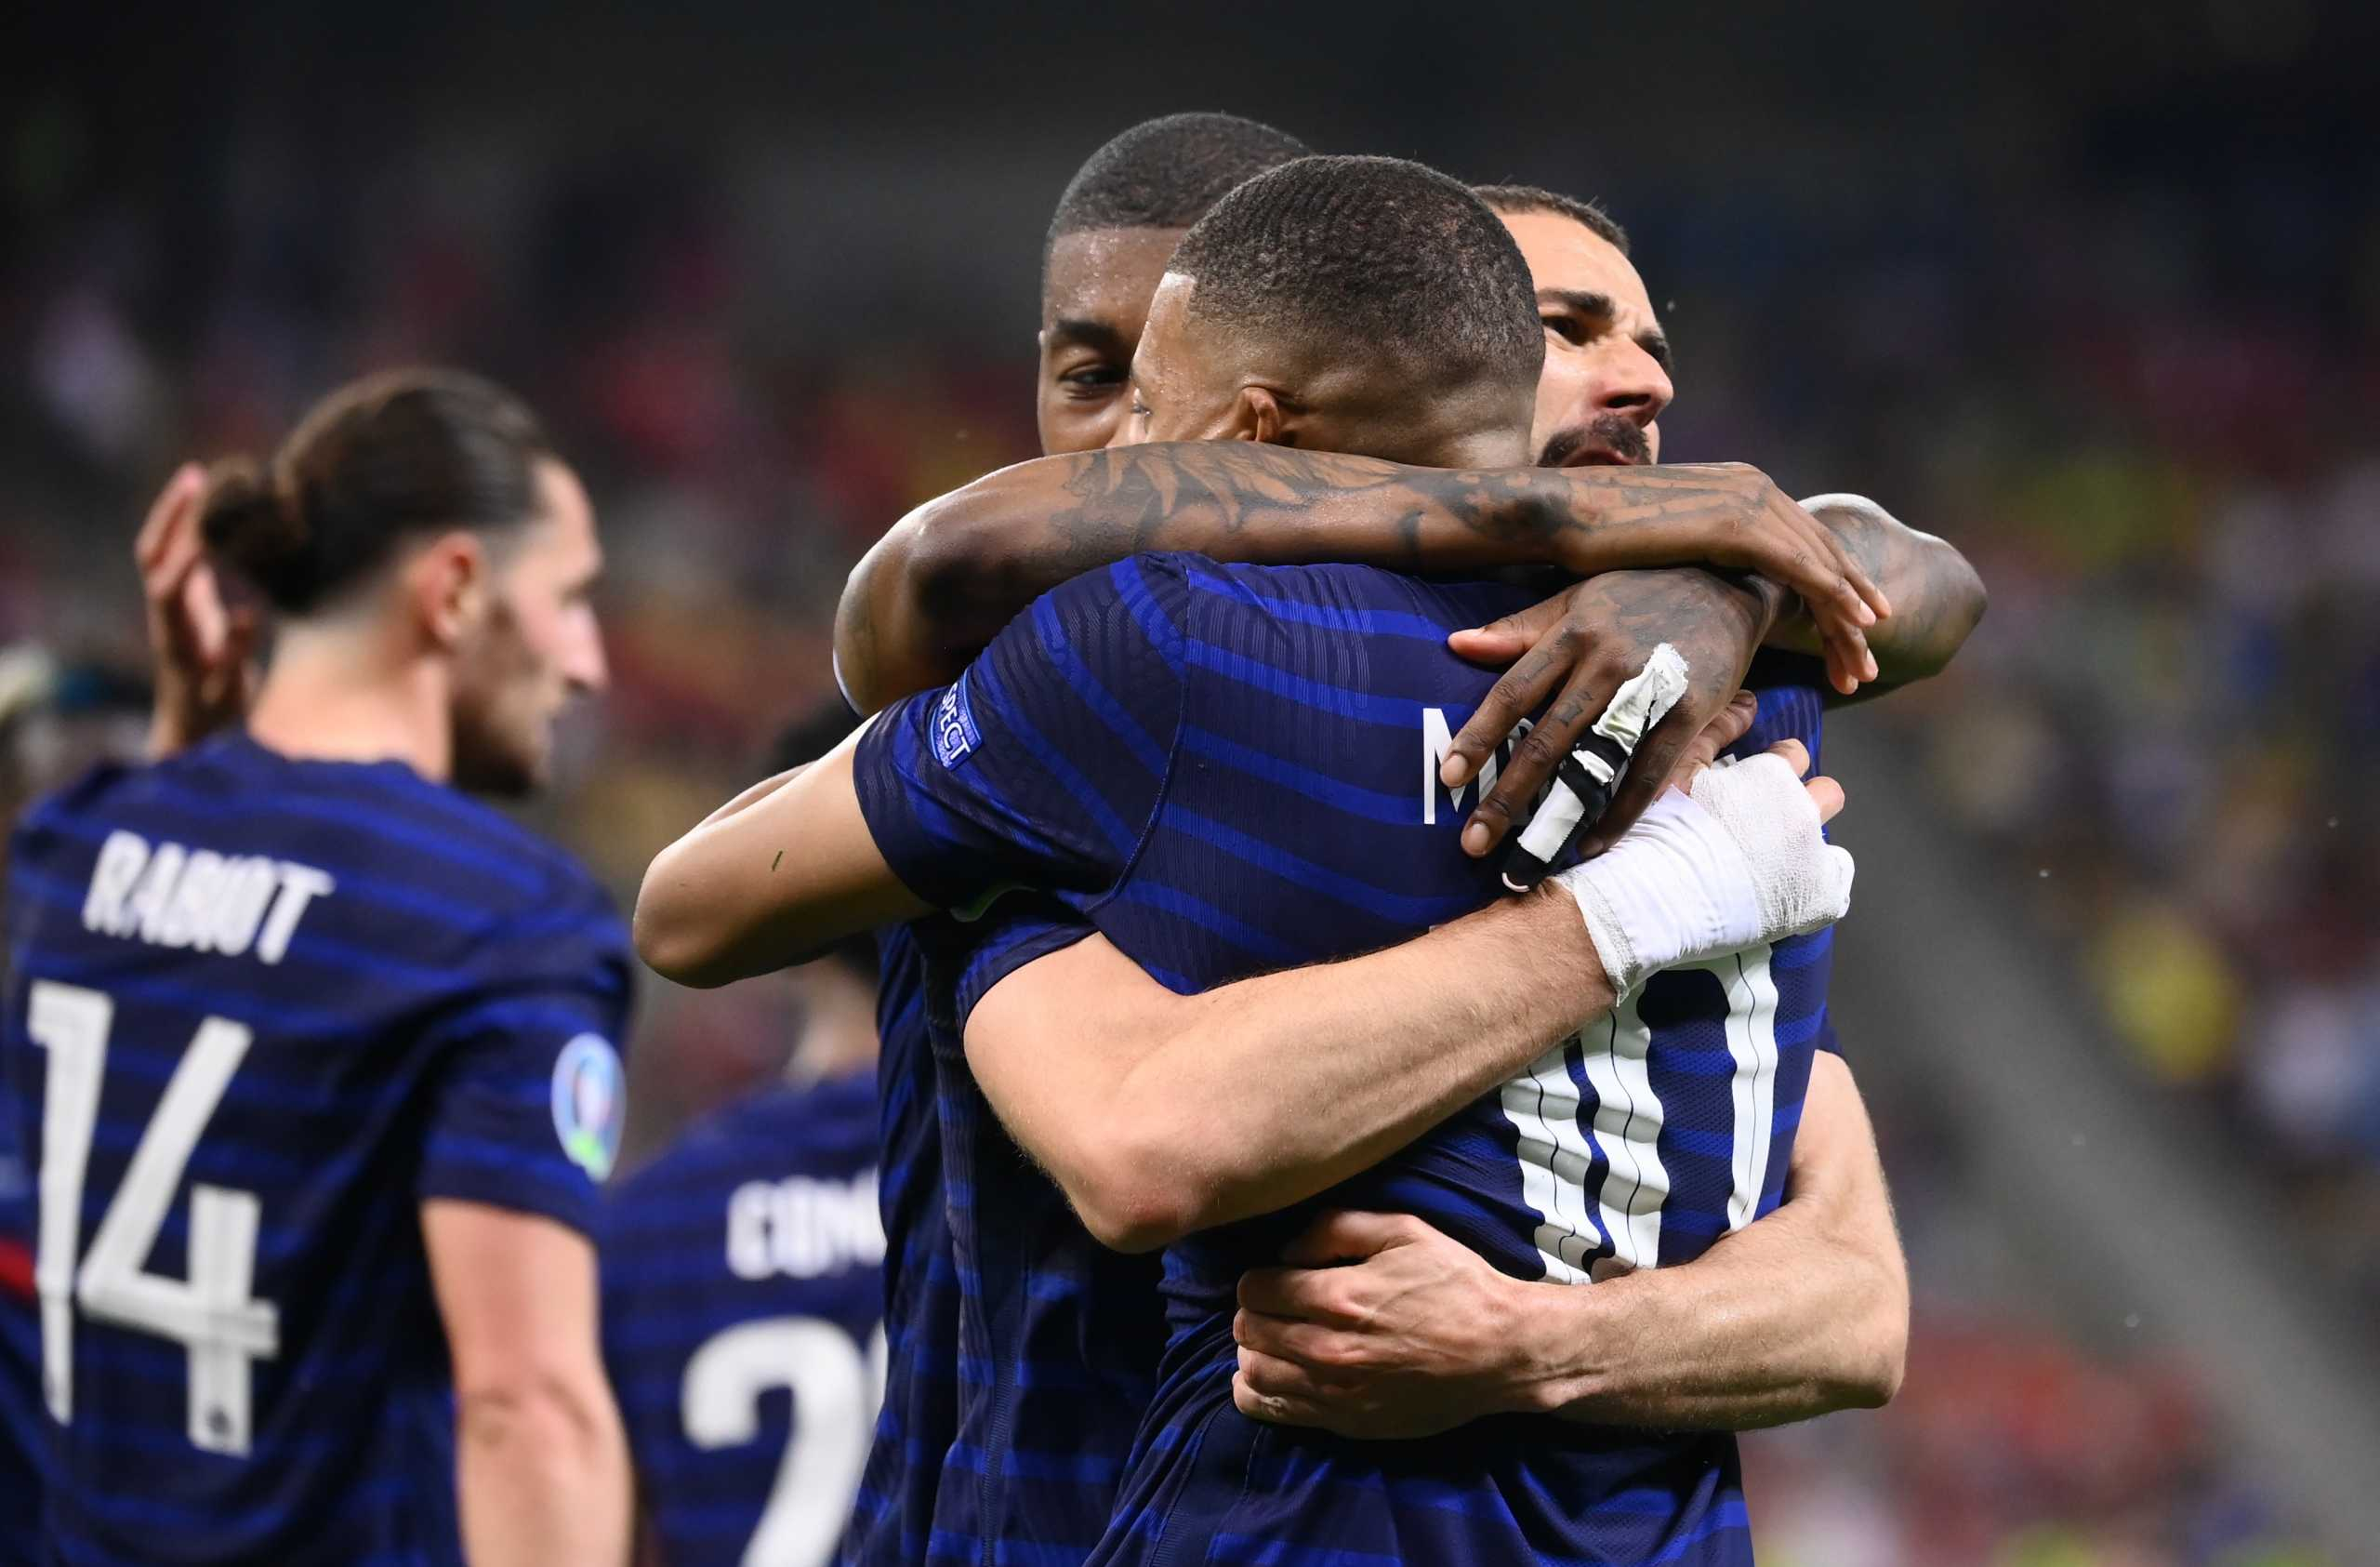 Euro 2020, Γαλλία – Ελβετία: Έγκλημα και τιμωρία Μπενζεμά